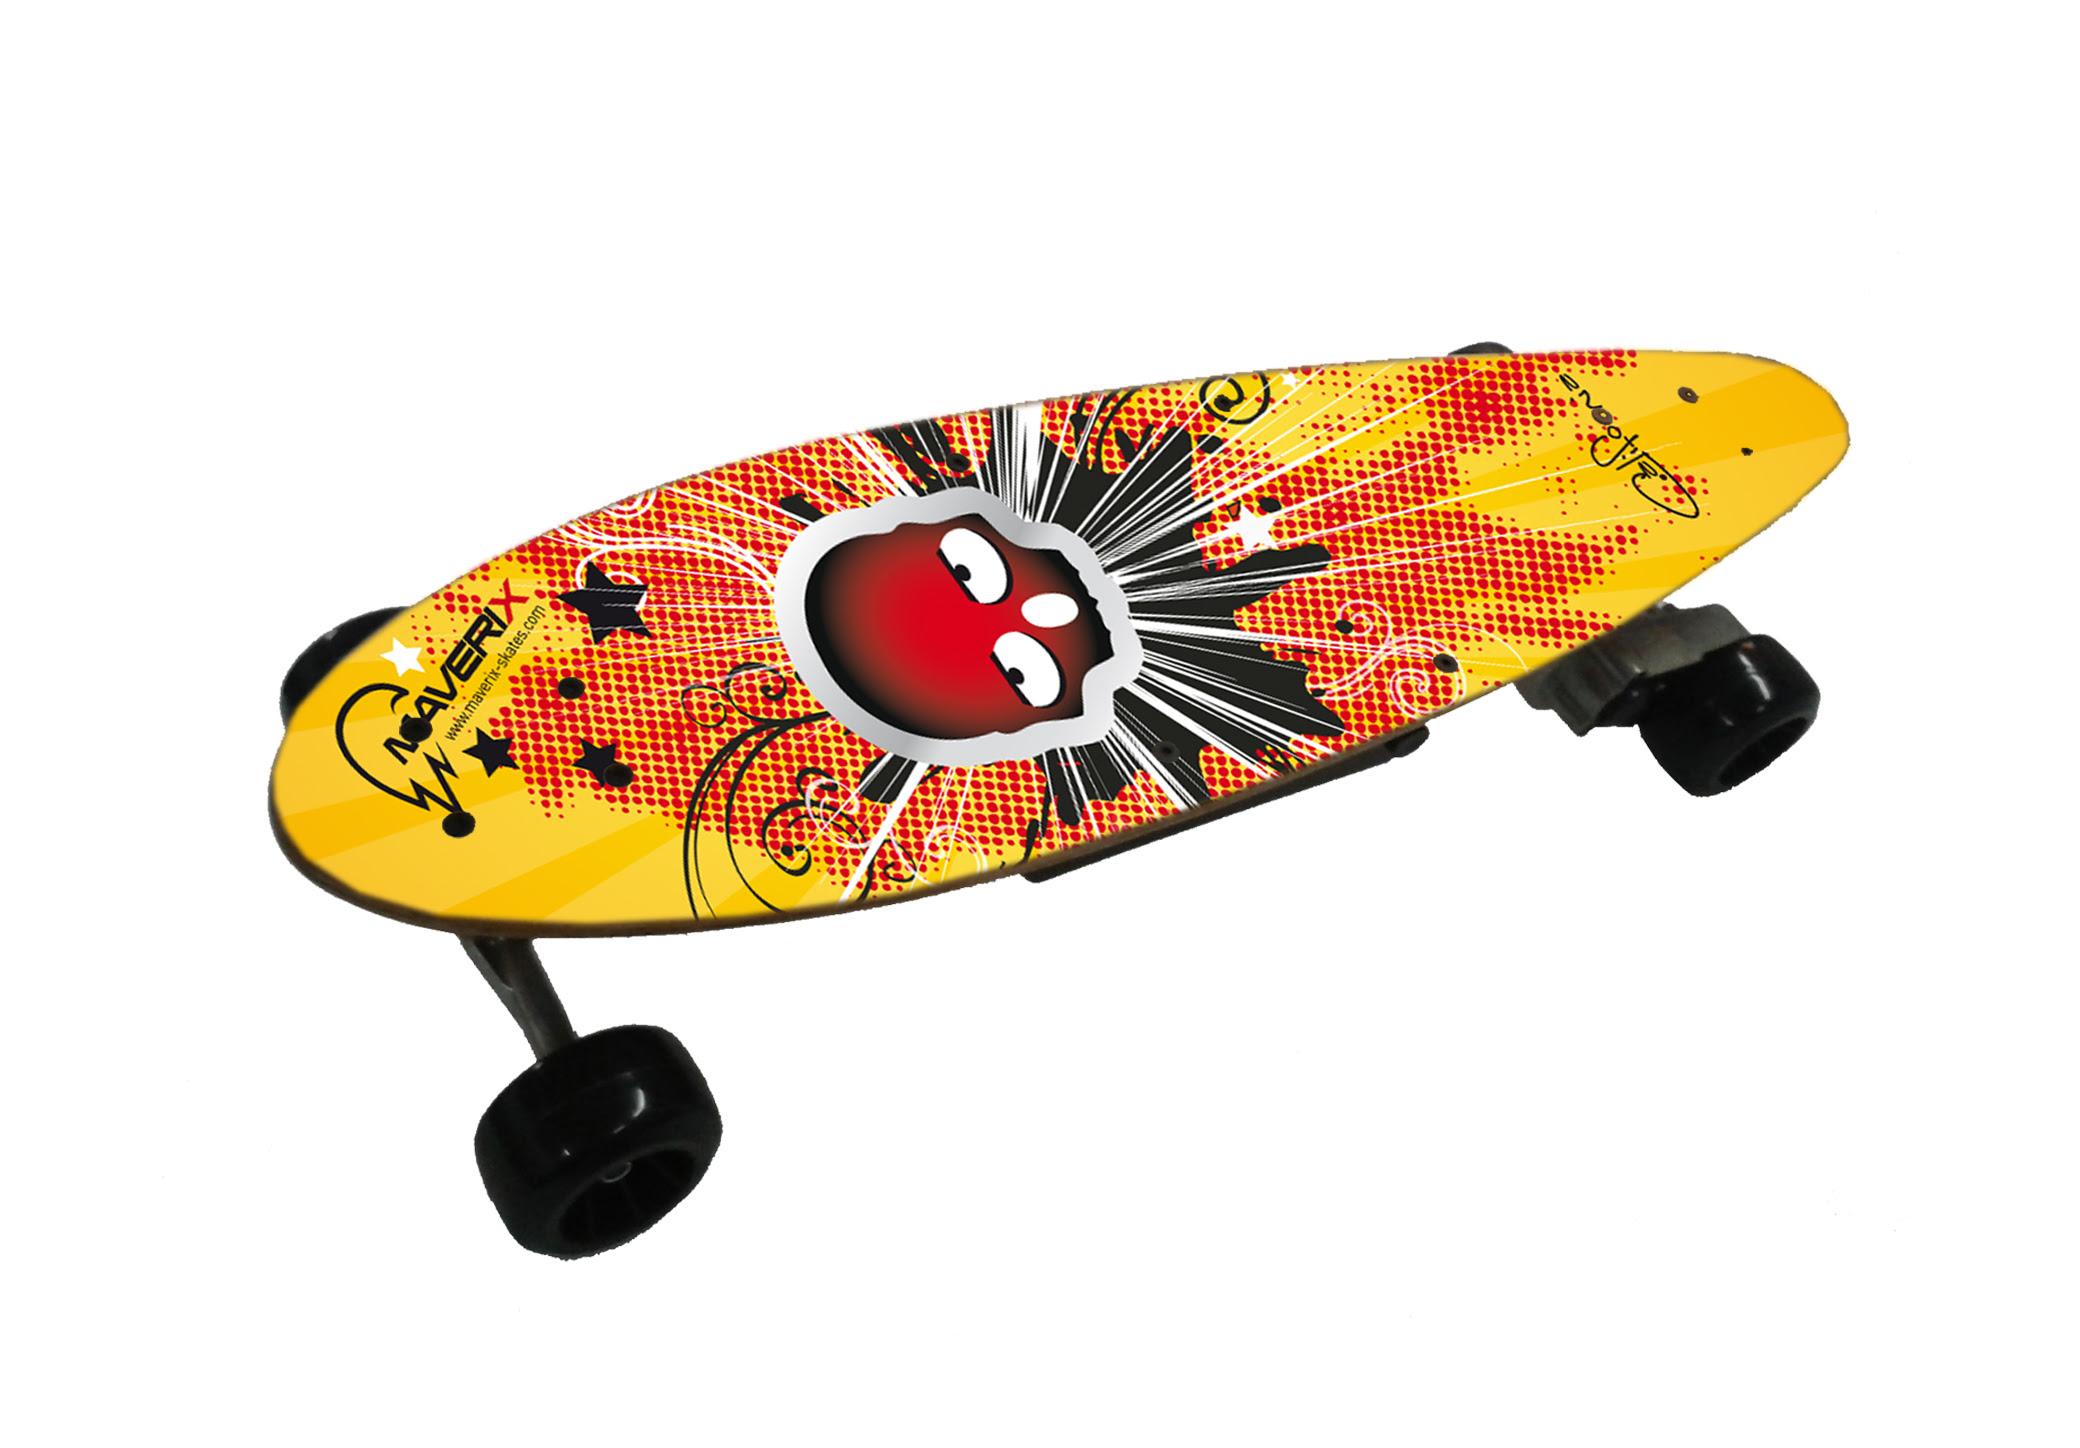 Maverix USA California 150W Electric Skateboard  Fitness \u0026 Sports  Wheeled Sports